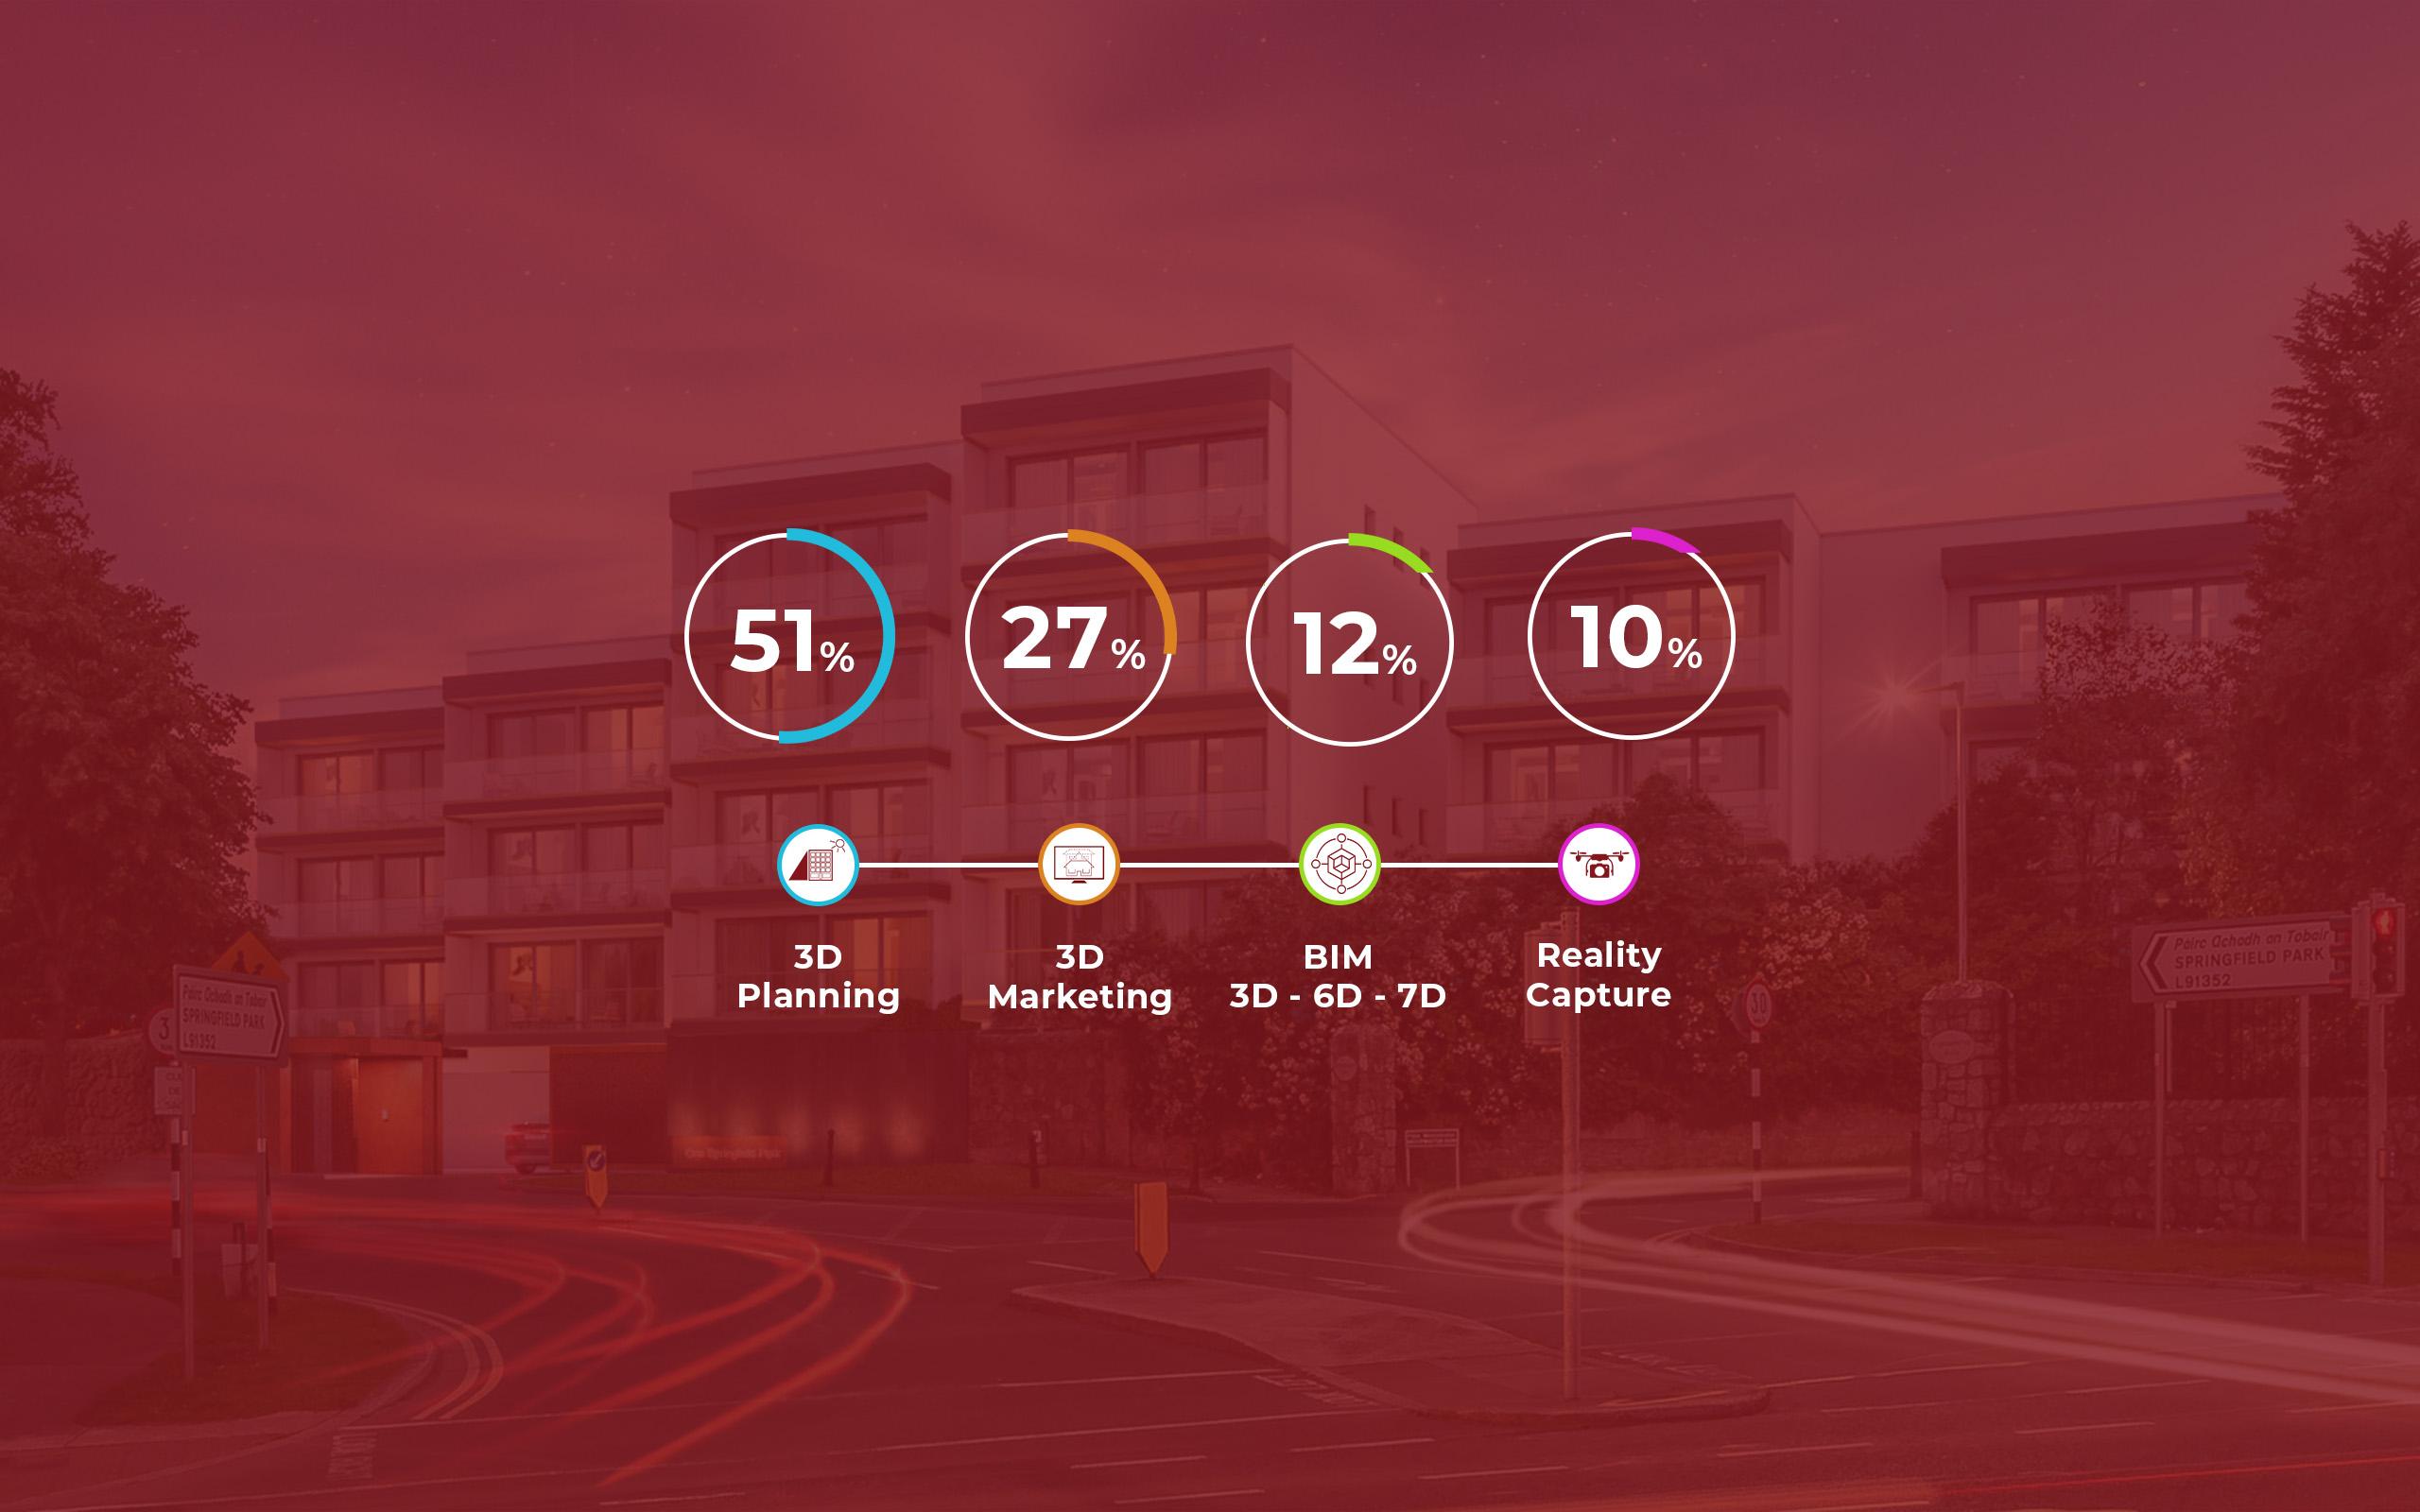 3D Design Bureau's July Breakdown of 3D Solutions.